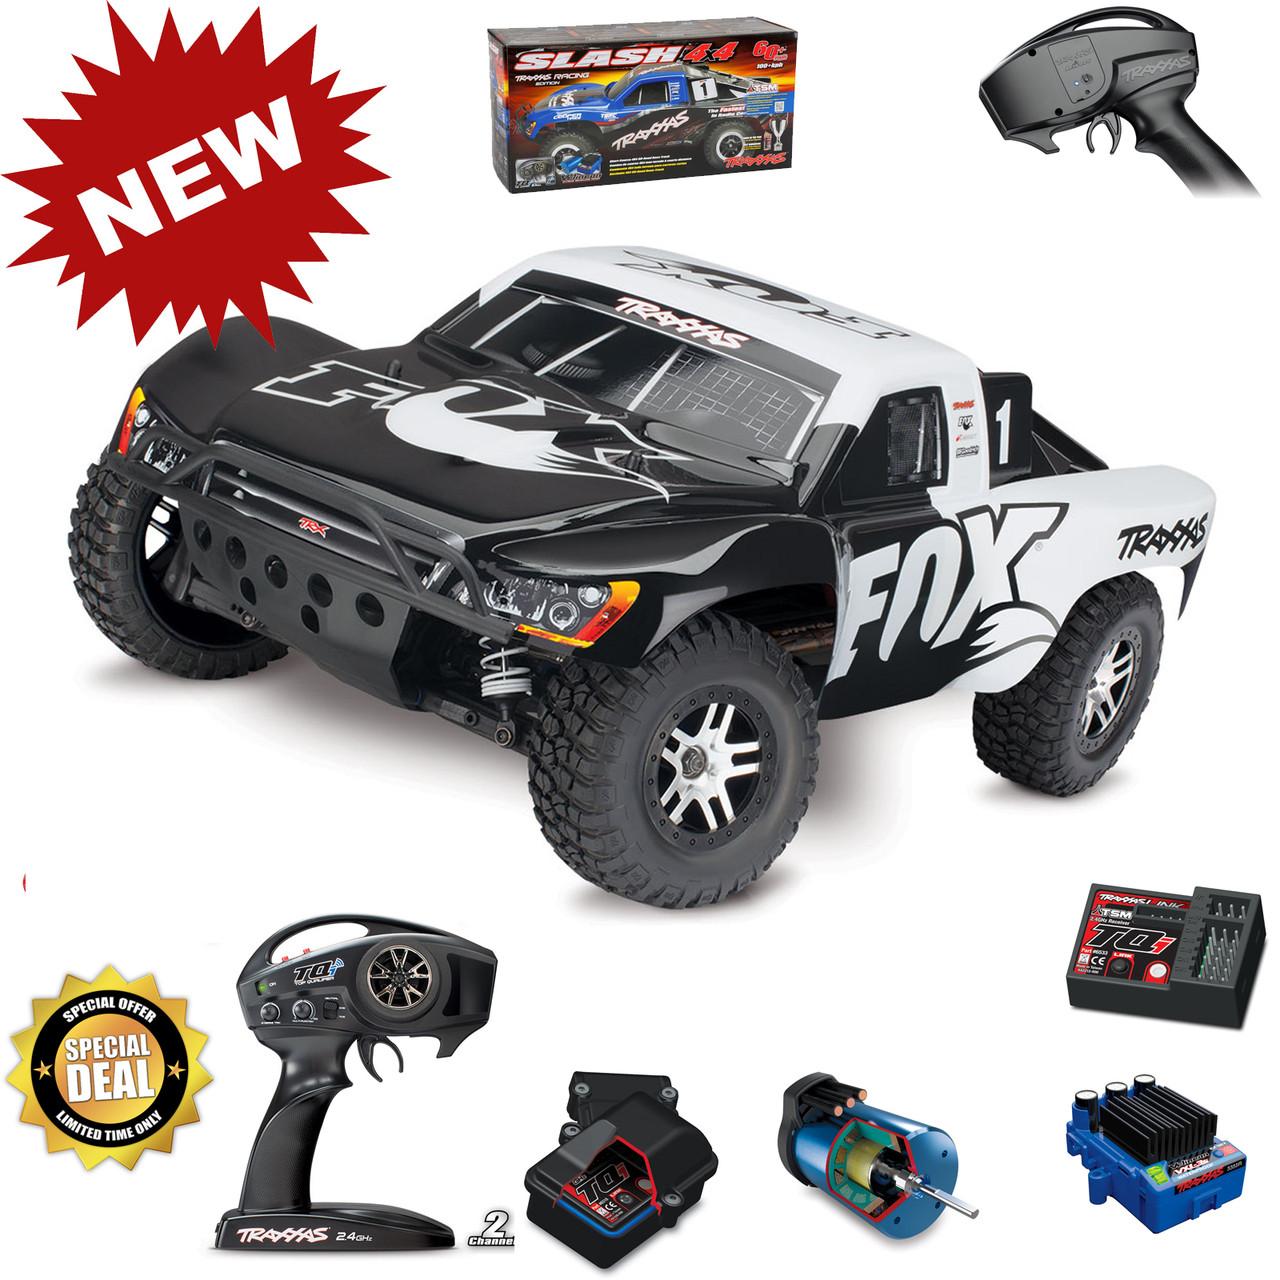 Traxxas 68086-4 Slash 4x4 VXL Brushless RTR White Fox Short Course Racing  Truck TSM w/ Battery & Charger